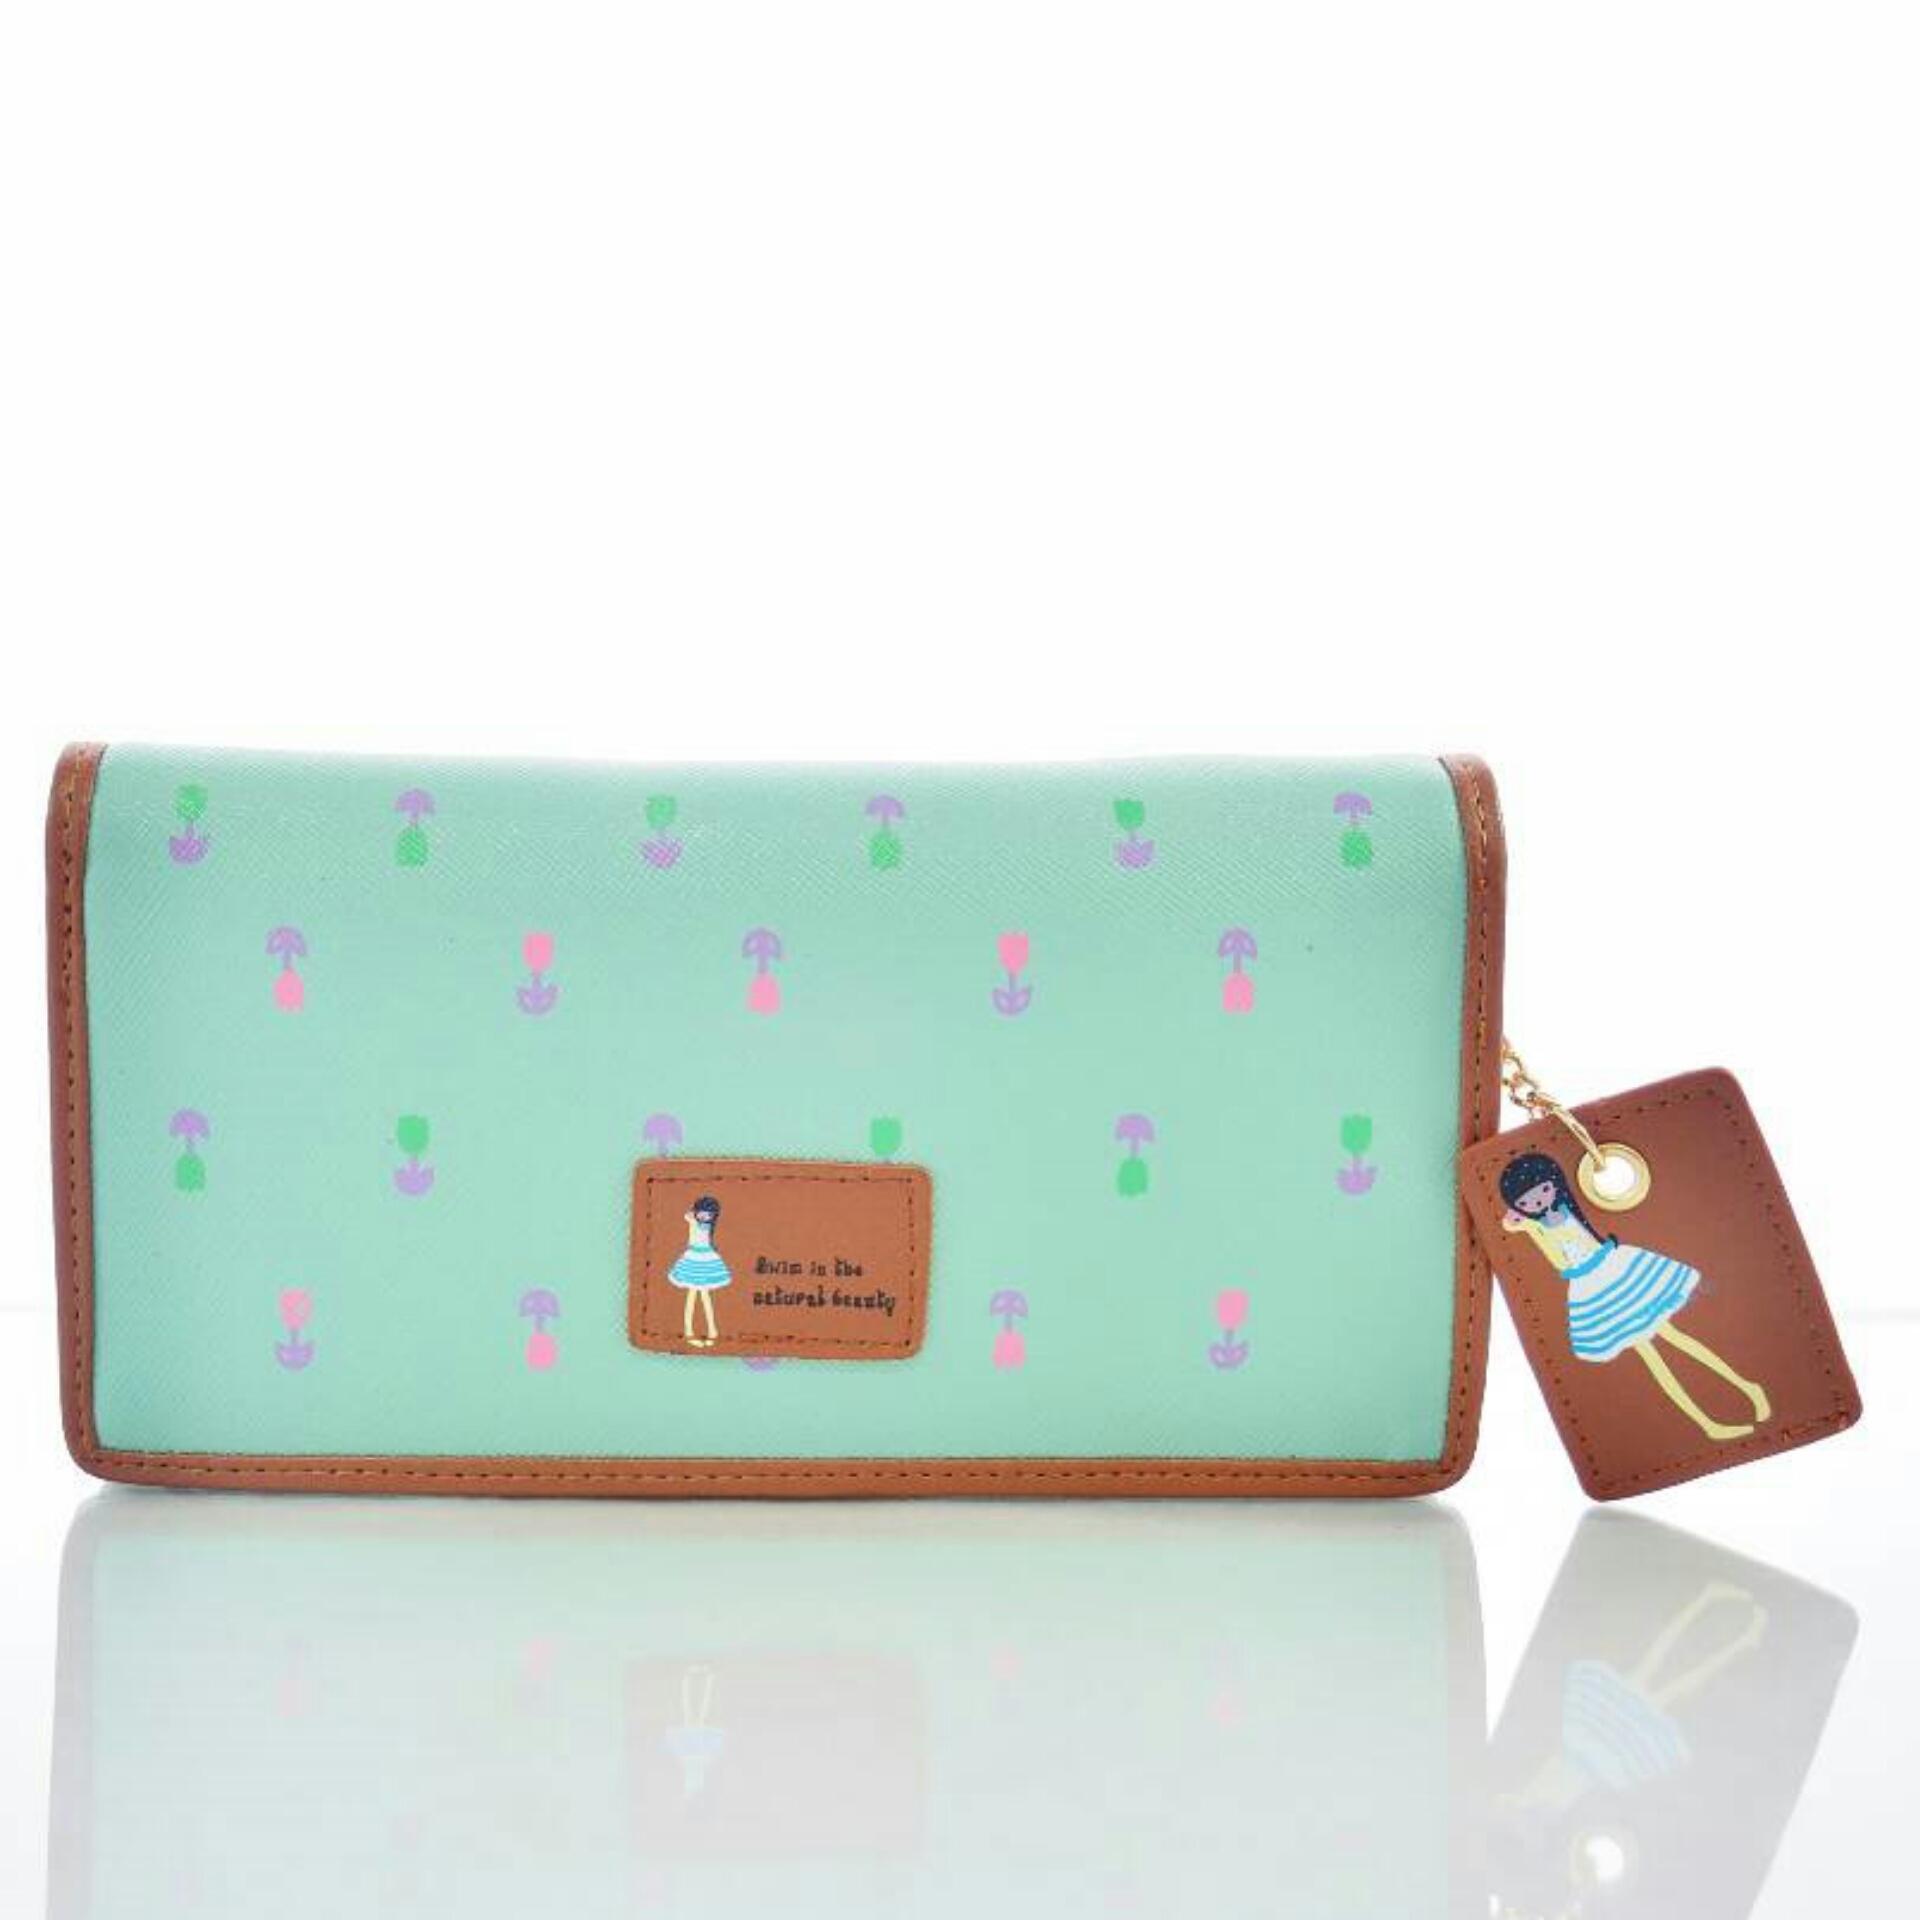 Jims Honey Dompet Fashion Queenie Wallet Tosca Daftar Update Harga Dolly Hp Multifungsi Ungu Muda Source